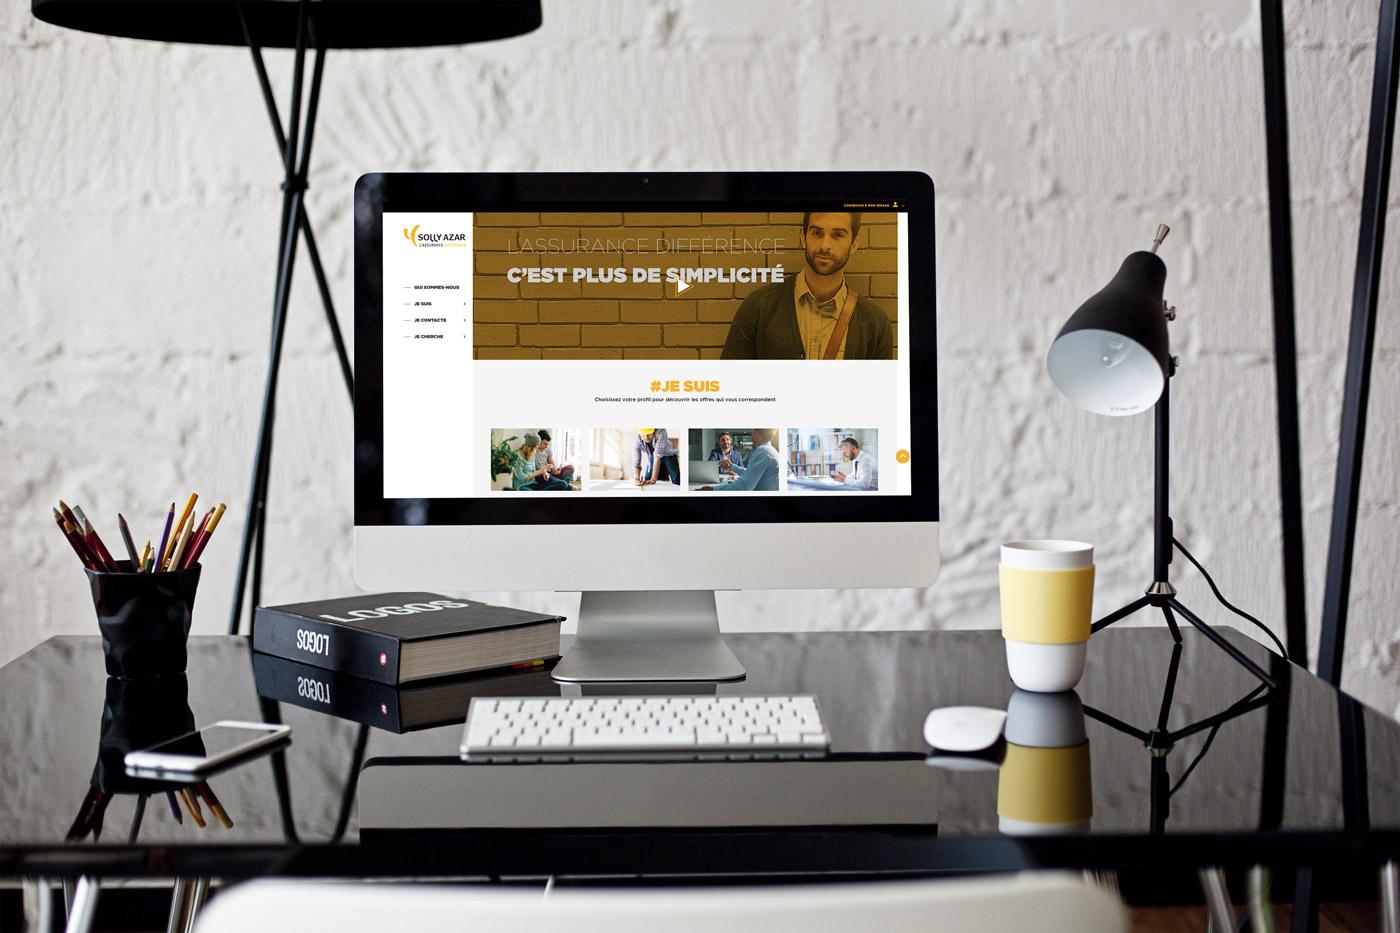 solly azar inaugure sa transformation digitale solly azar assurances. Black Bedroom Furniture Sets. Home Design Ideas